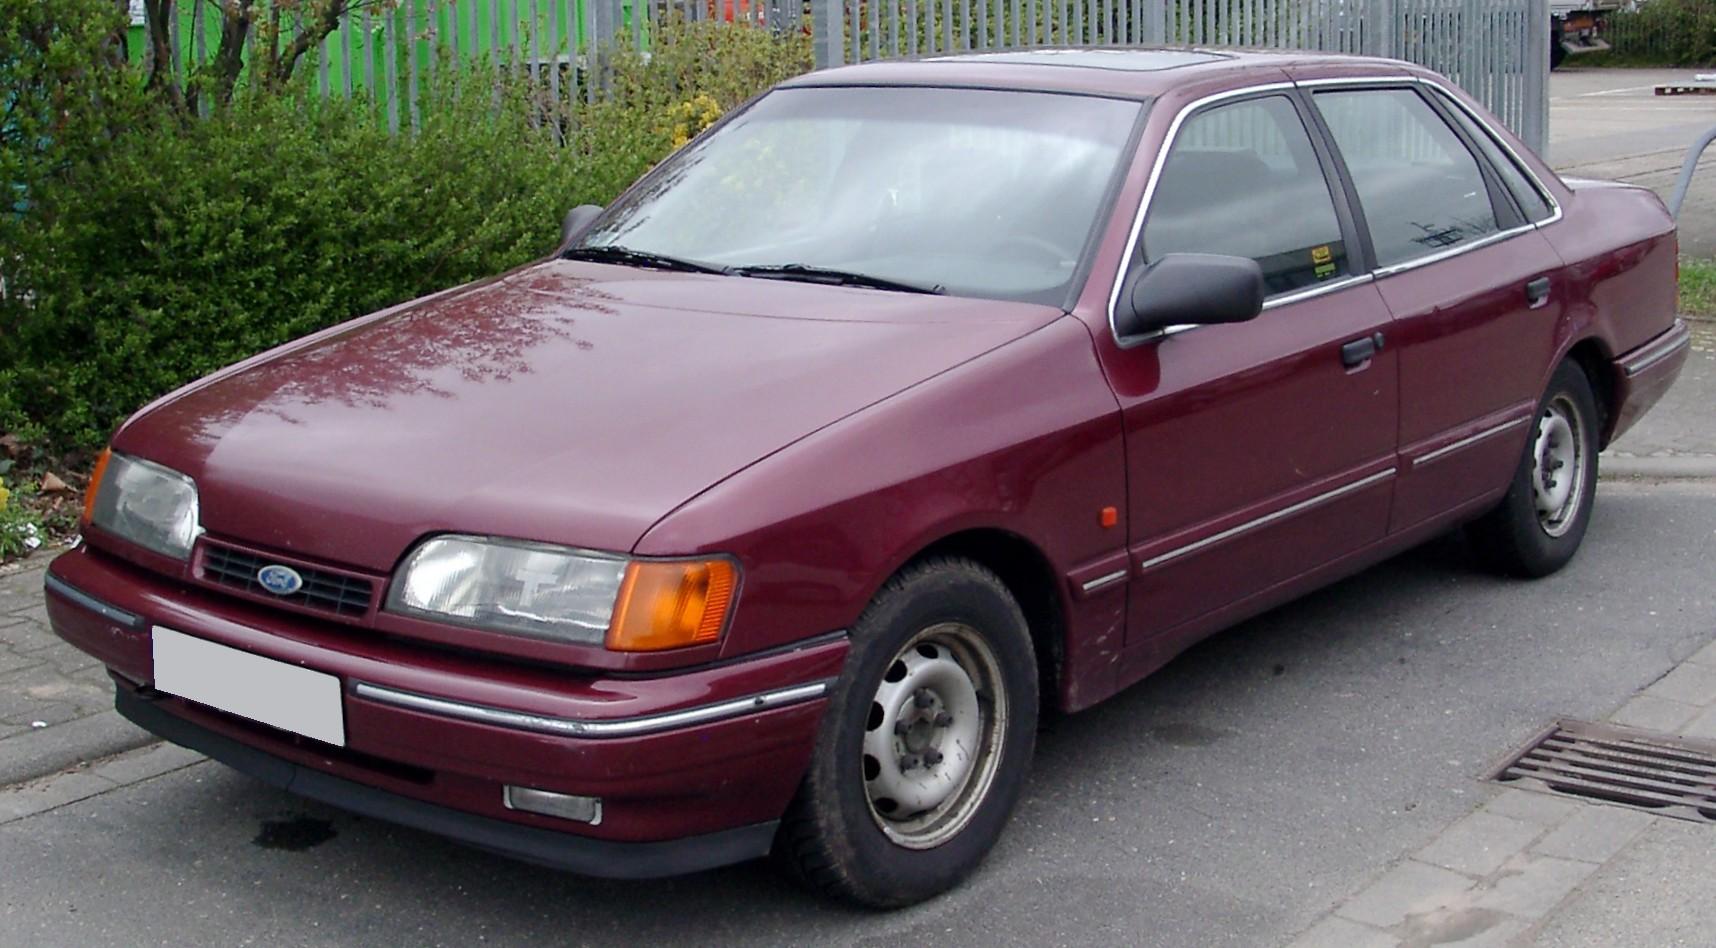 ford scorpio, 1990 v6